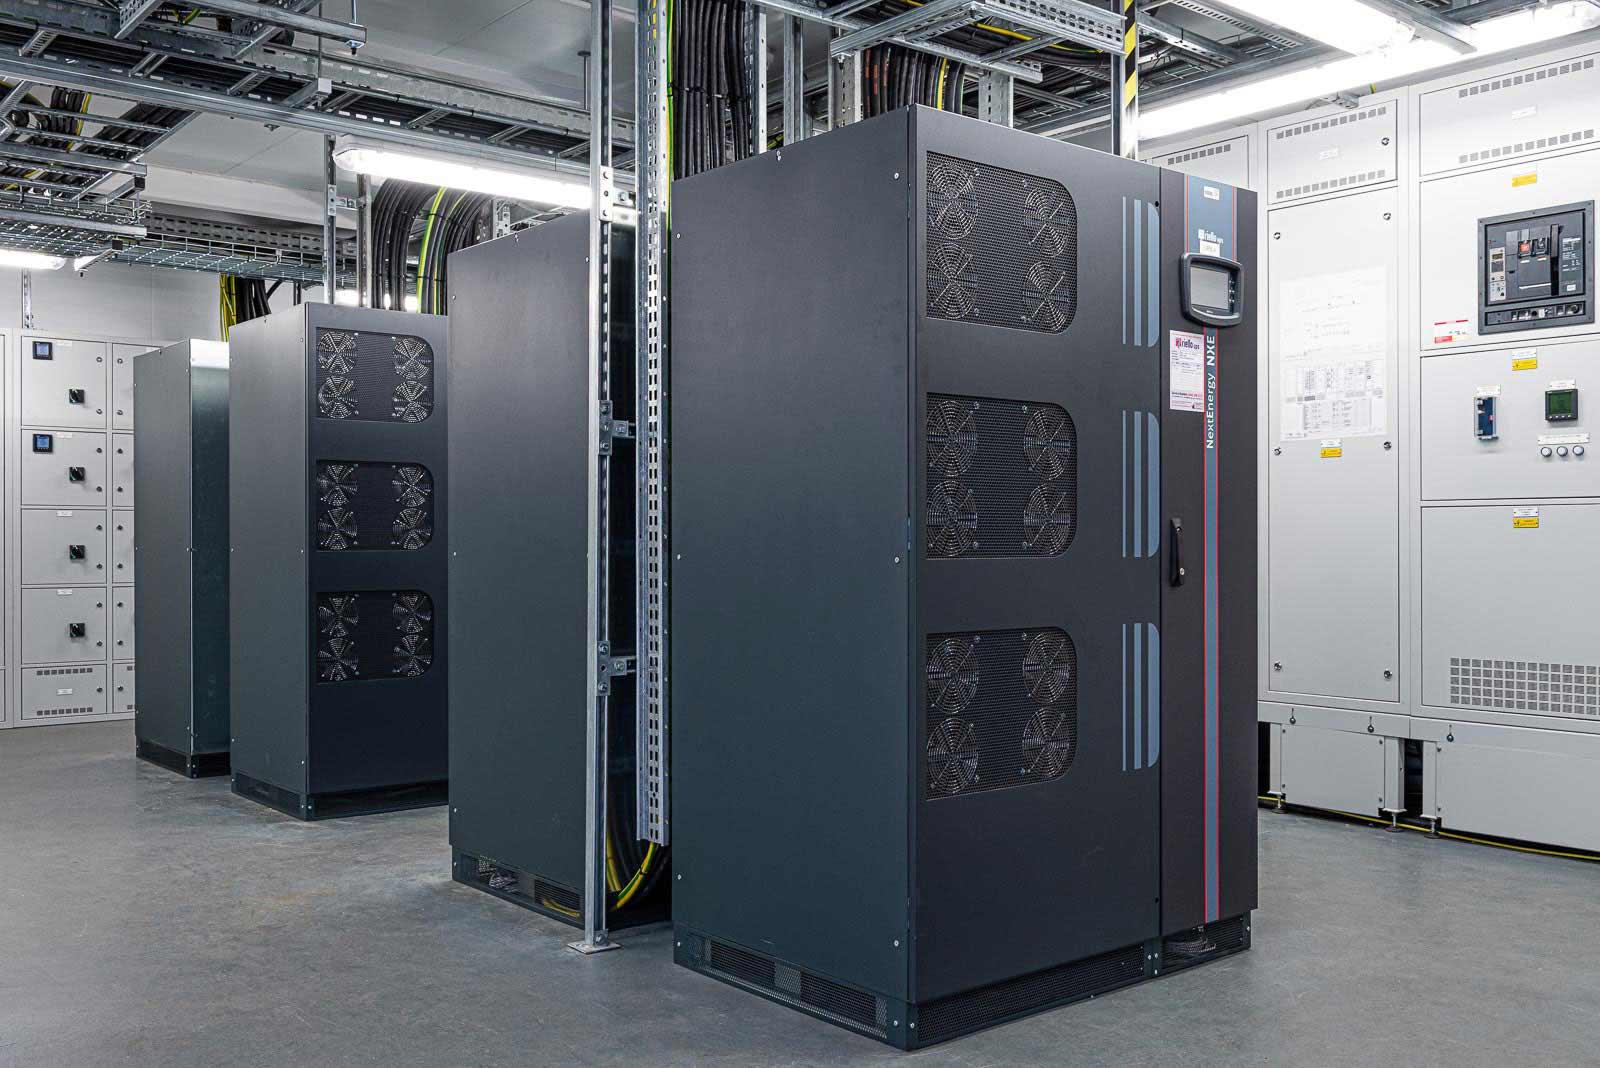 Data Centre at Warwick University